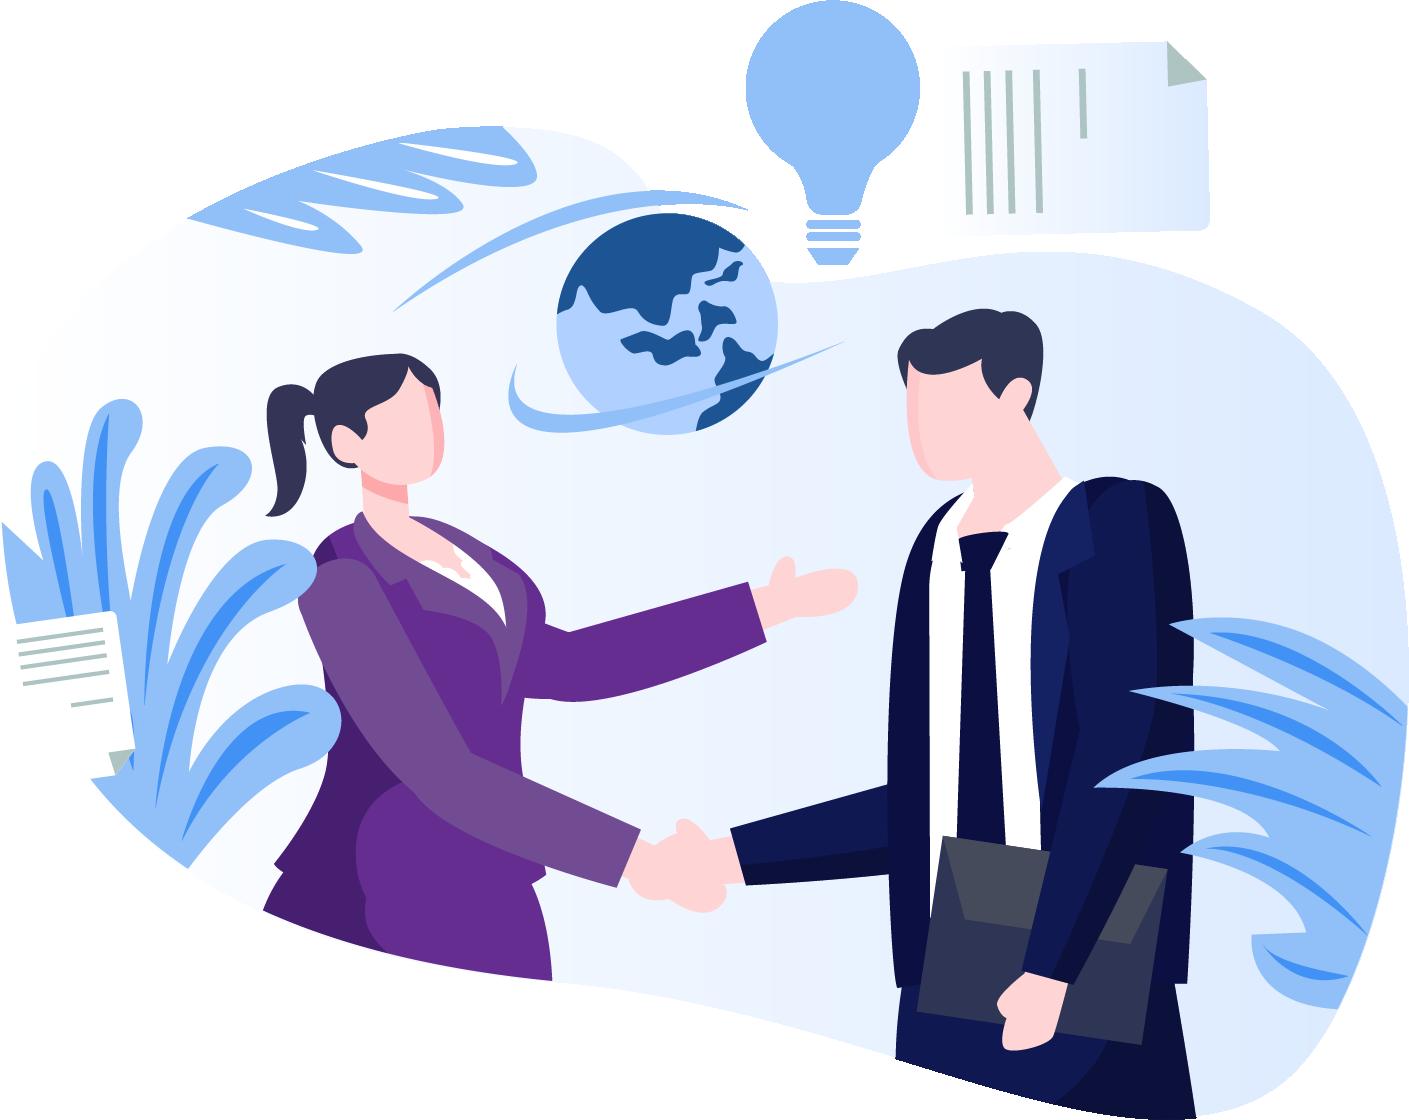 Partnership with WhistleForm